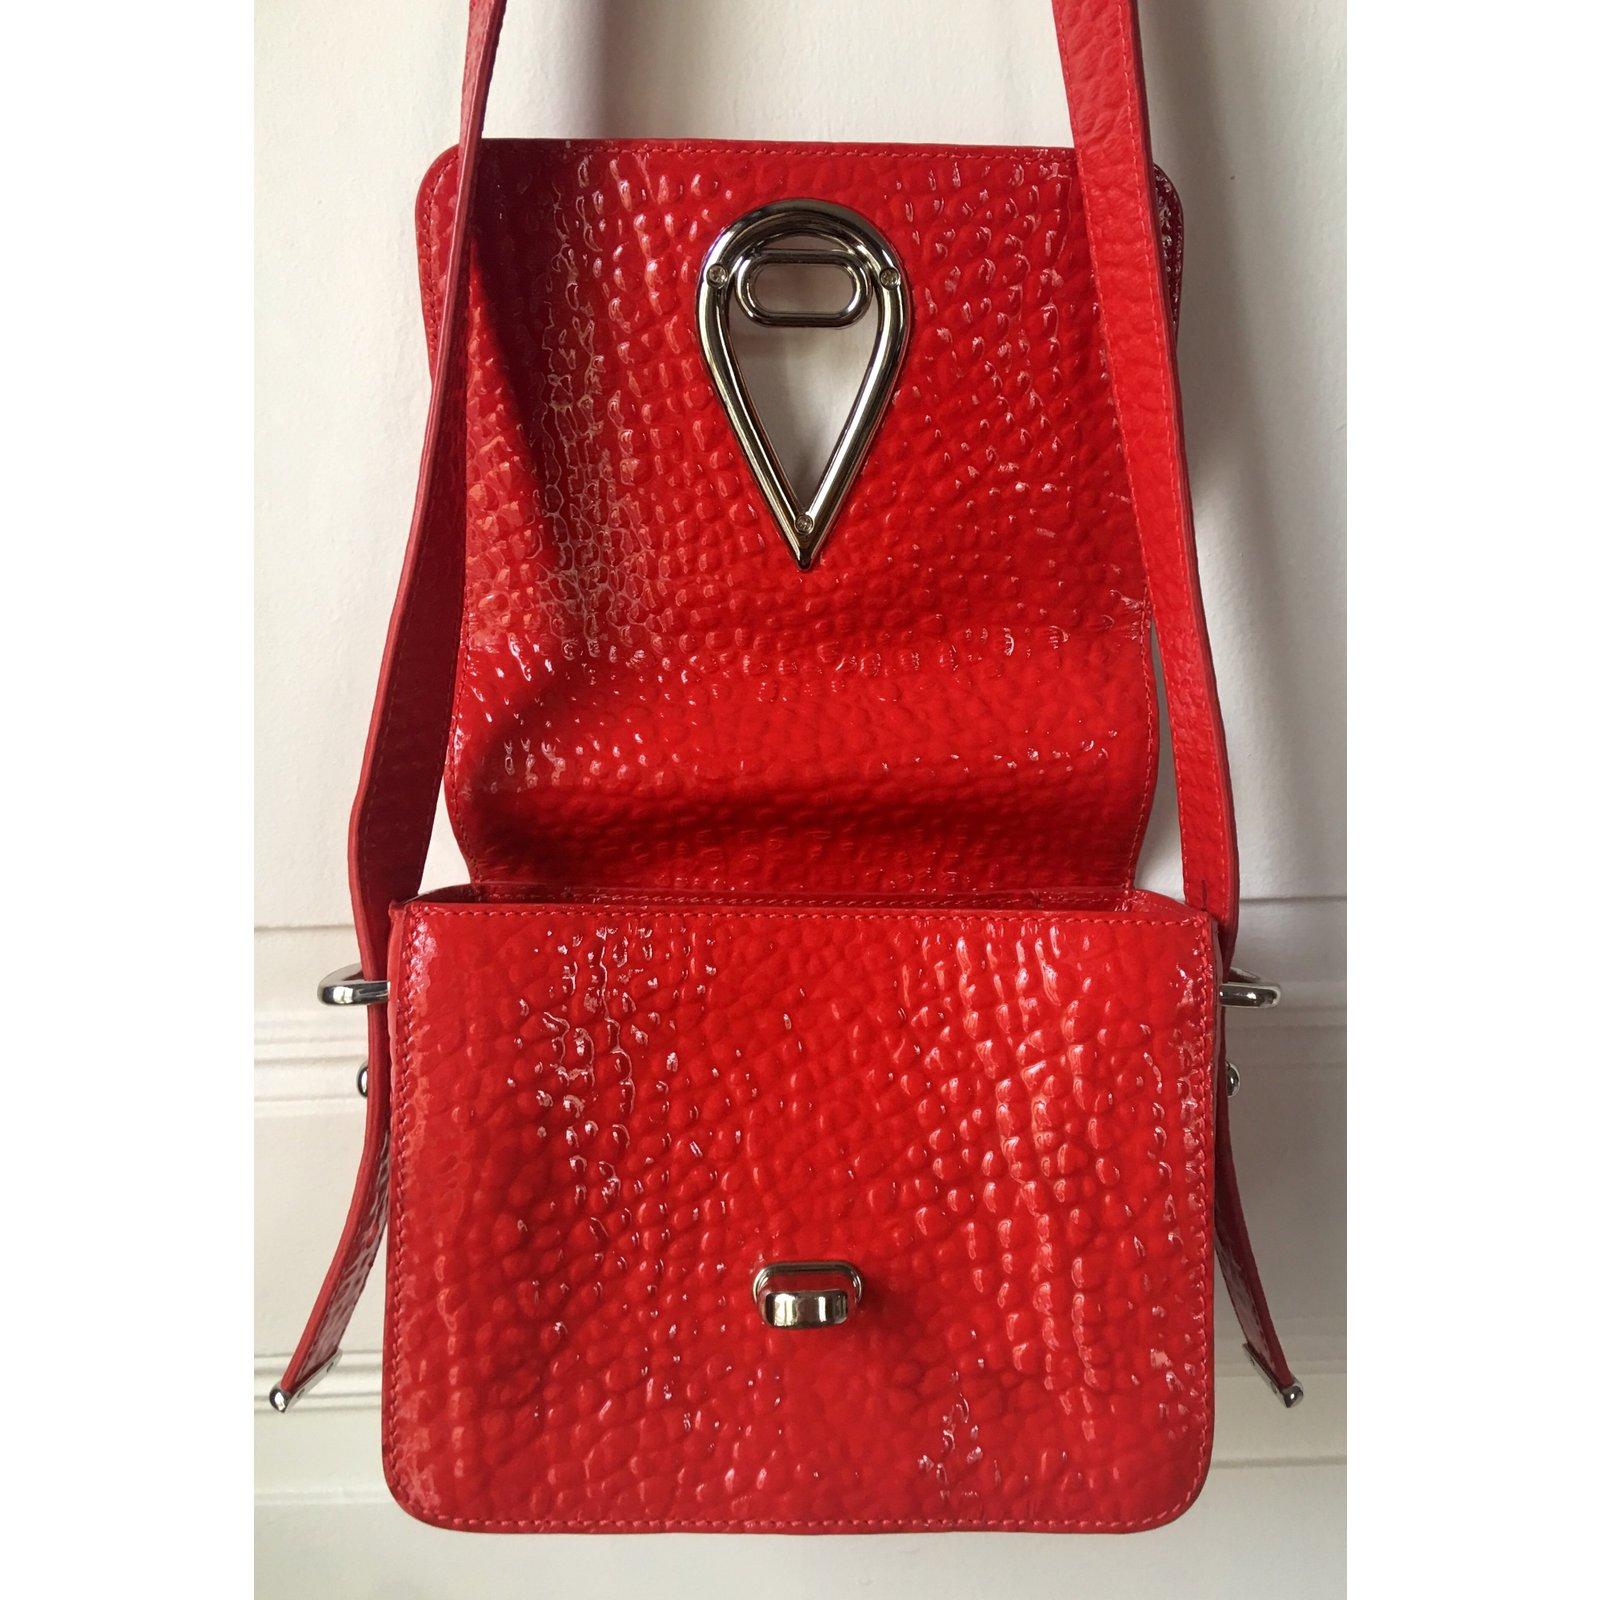 0791c7d0ef Kenzo Raindrop Handbags Leather,Patent leather Silvery,Red,Orange ref.95095  - Joli Closet